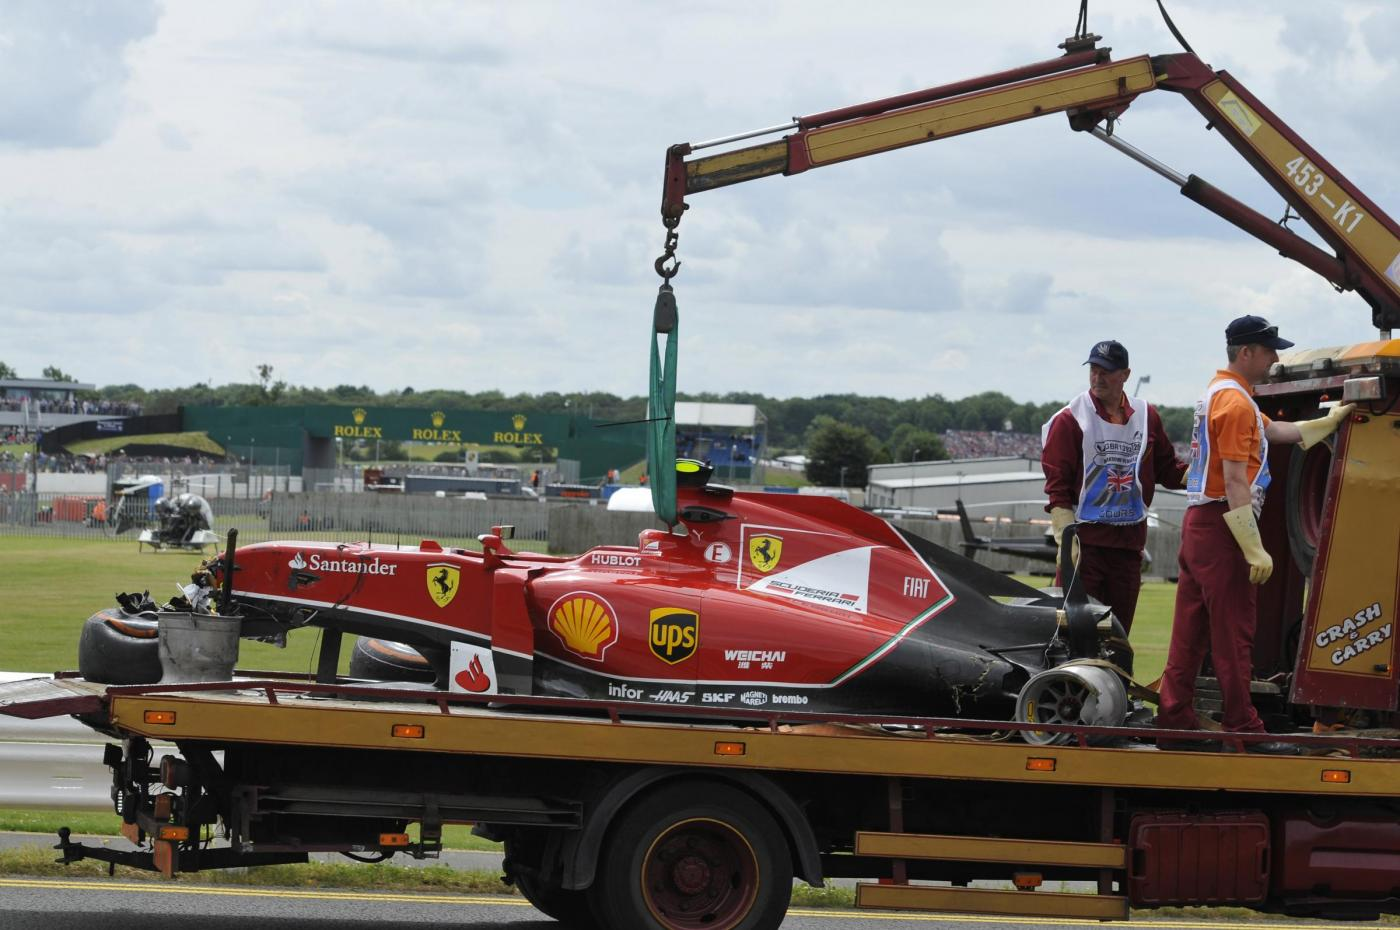 GP Silverstone F1 2014: vince Hamilton, a muro Raikkonen